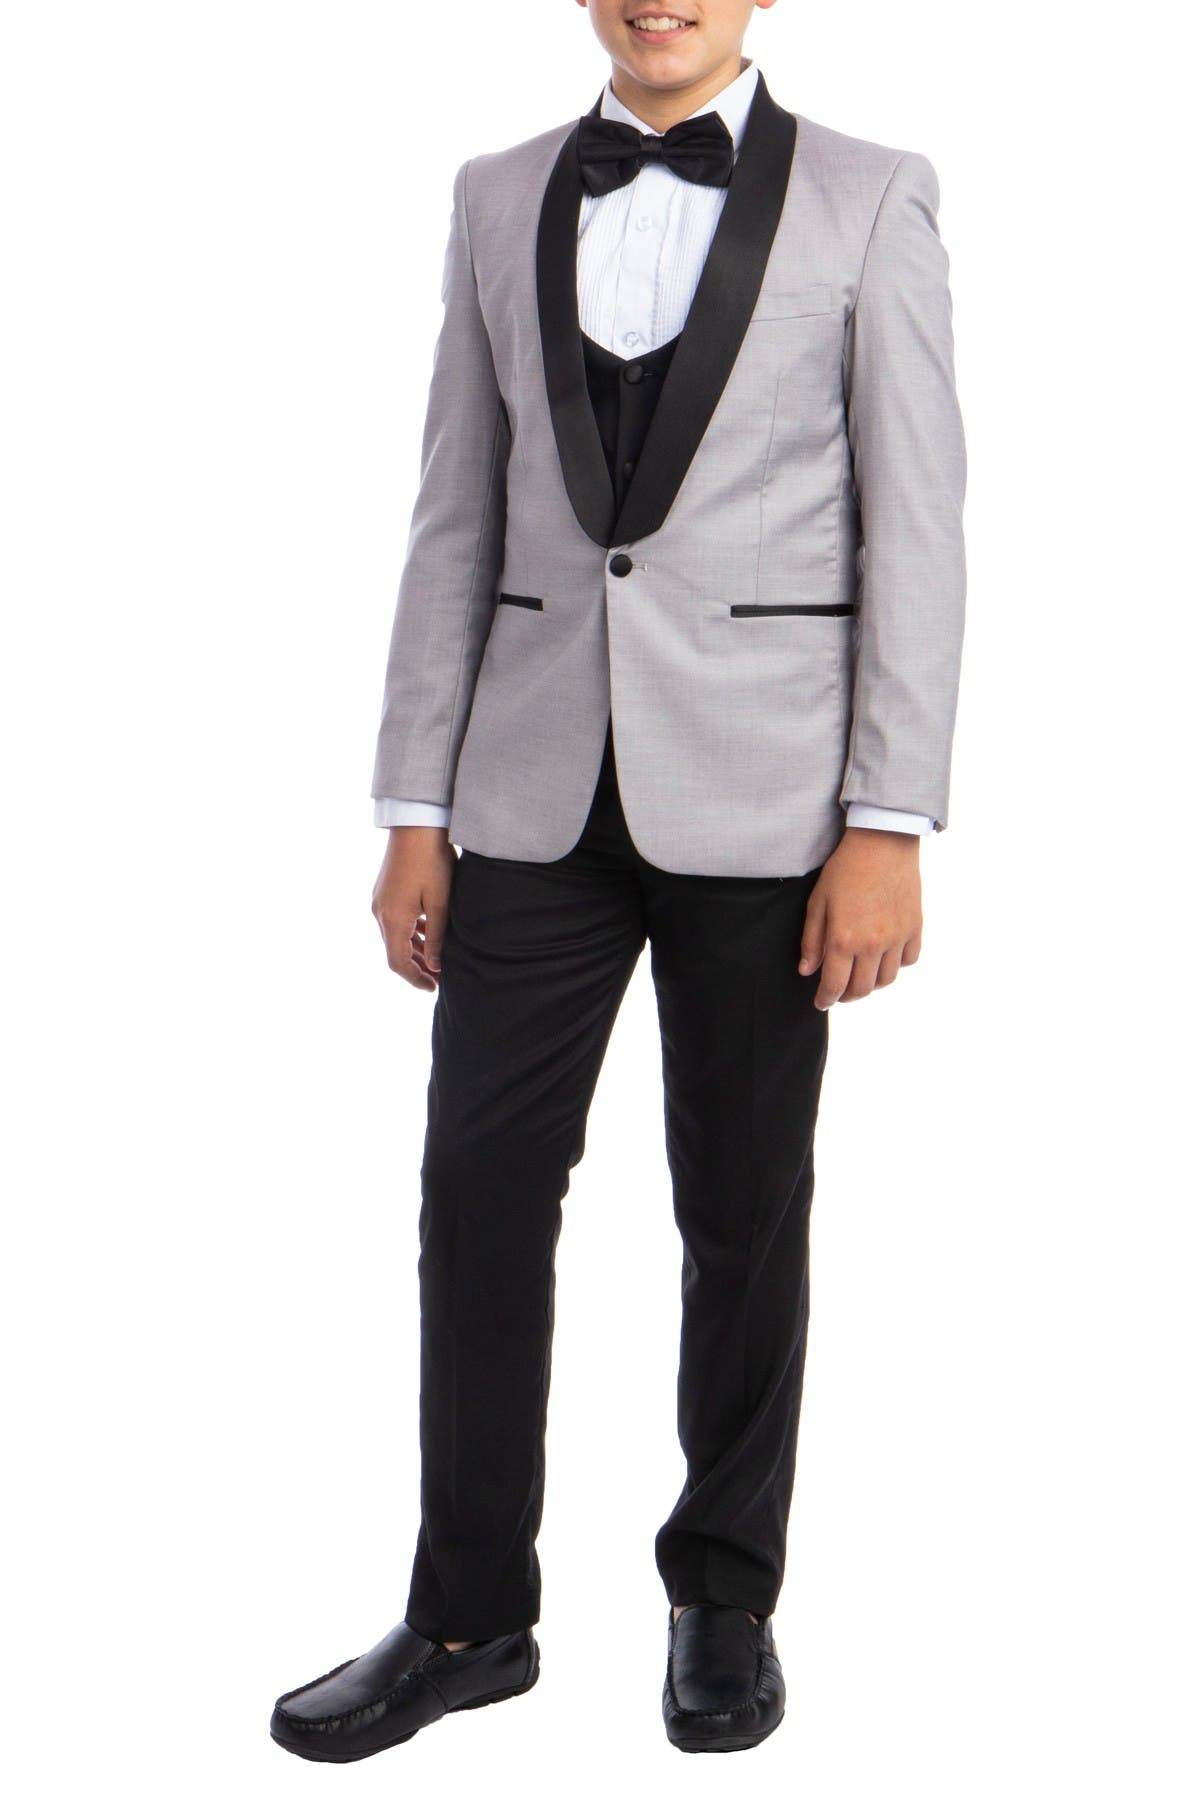 Image of Perry Ellis Portfolio Solid Shawl Collar 5-Piece Tuxedo